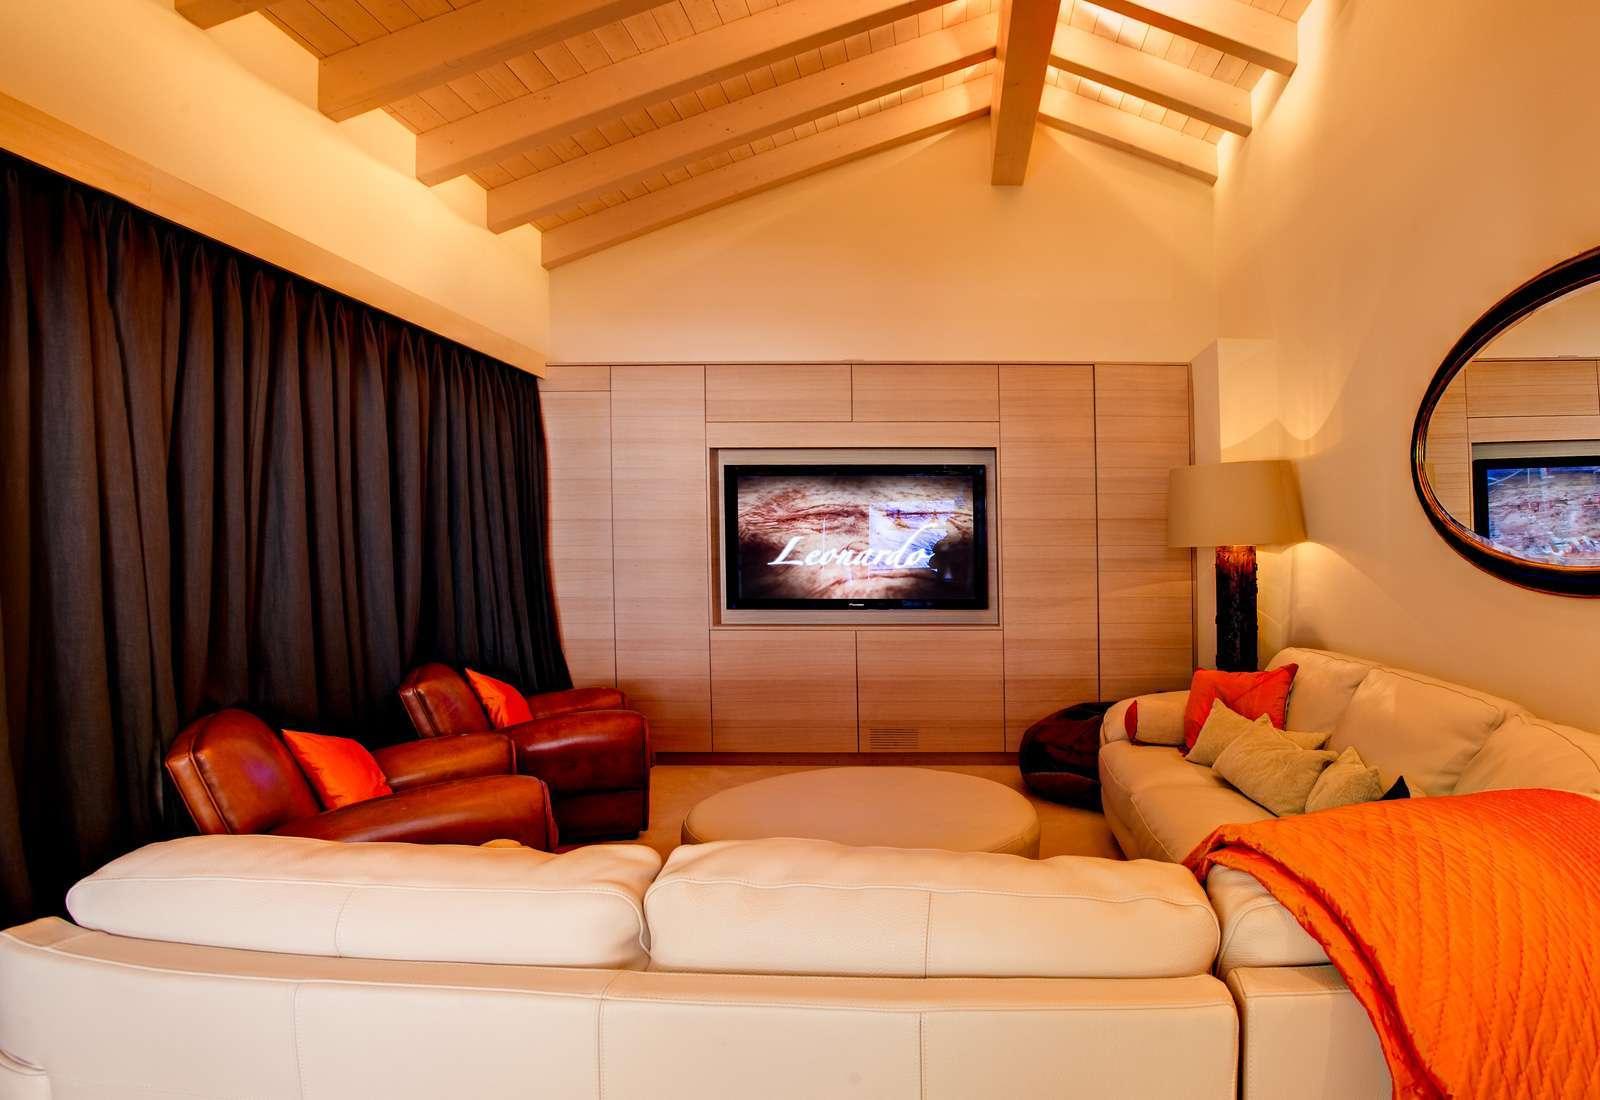 Kings avenue zermatt wifi sauna jacuzzi childfriendly - Sala de cine en casa ...